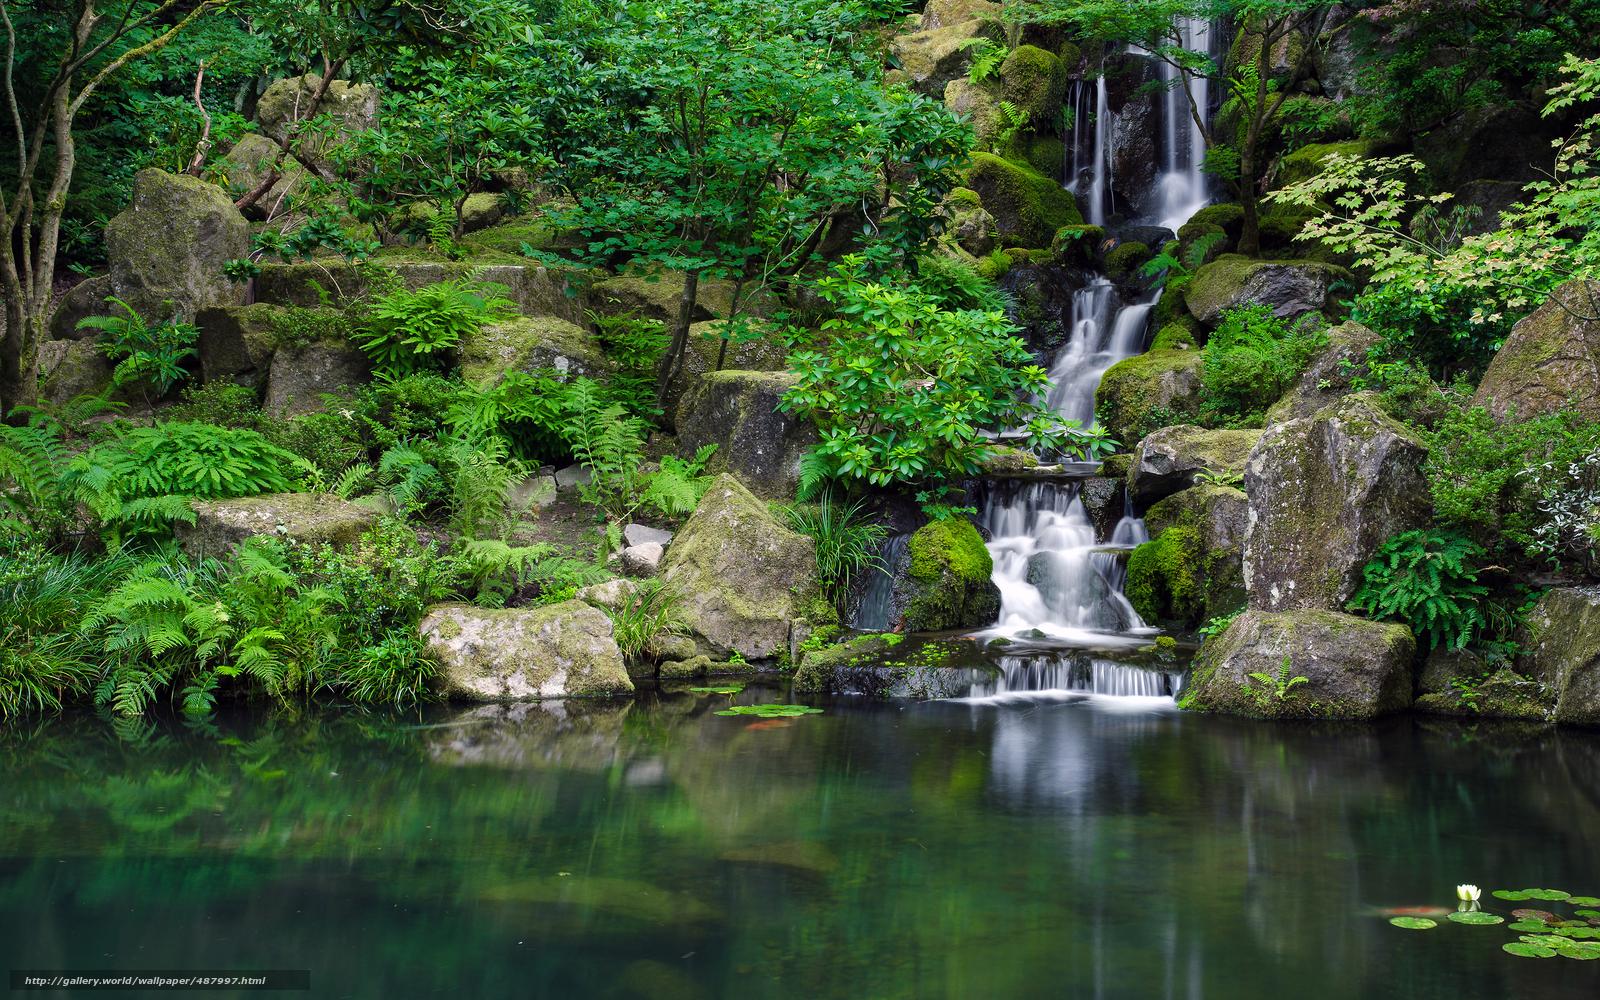 Download wallpaper Portland Japanese Garden In late summer 1600x1000